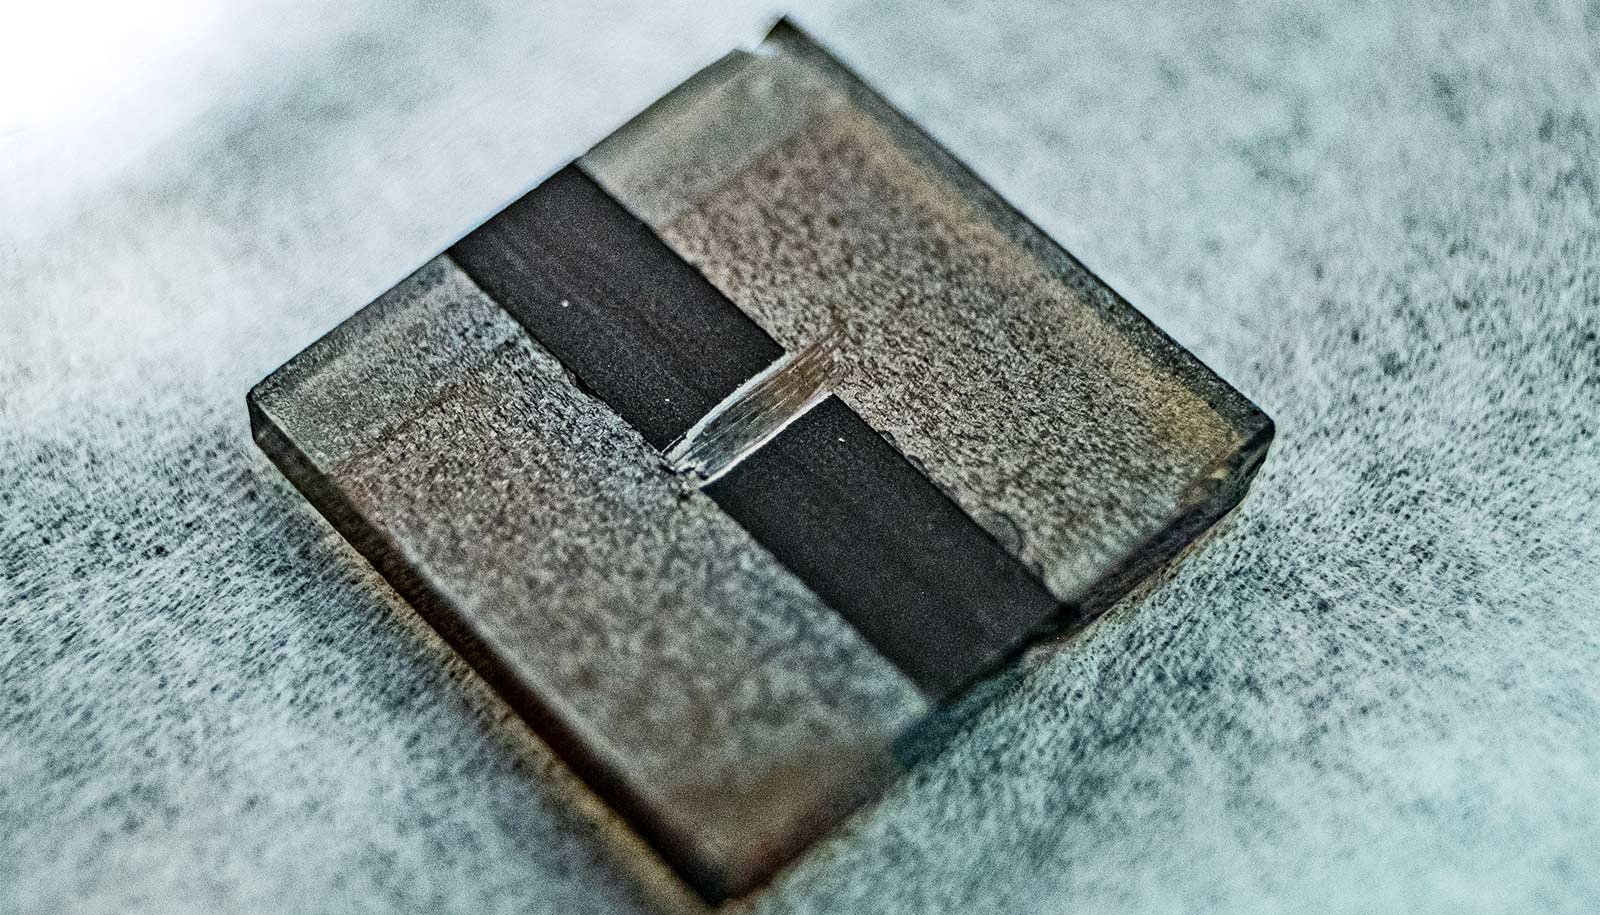 Upgrade makes perovskite solar cells last and last